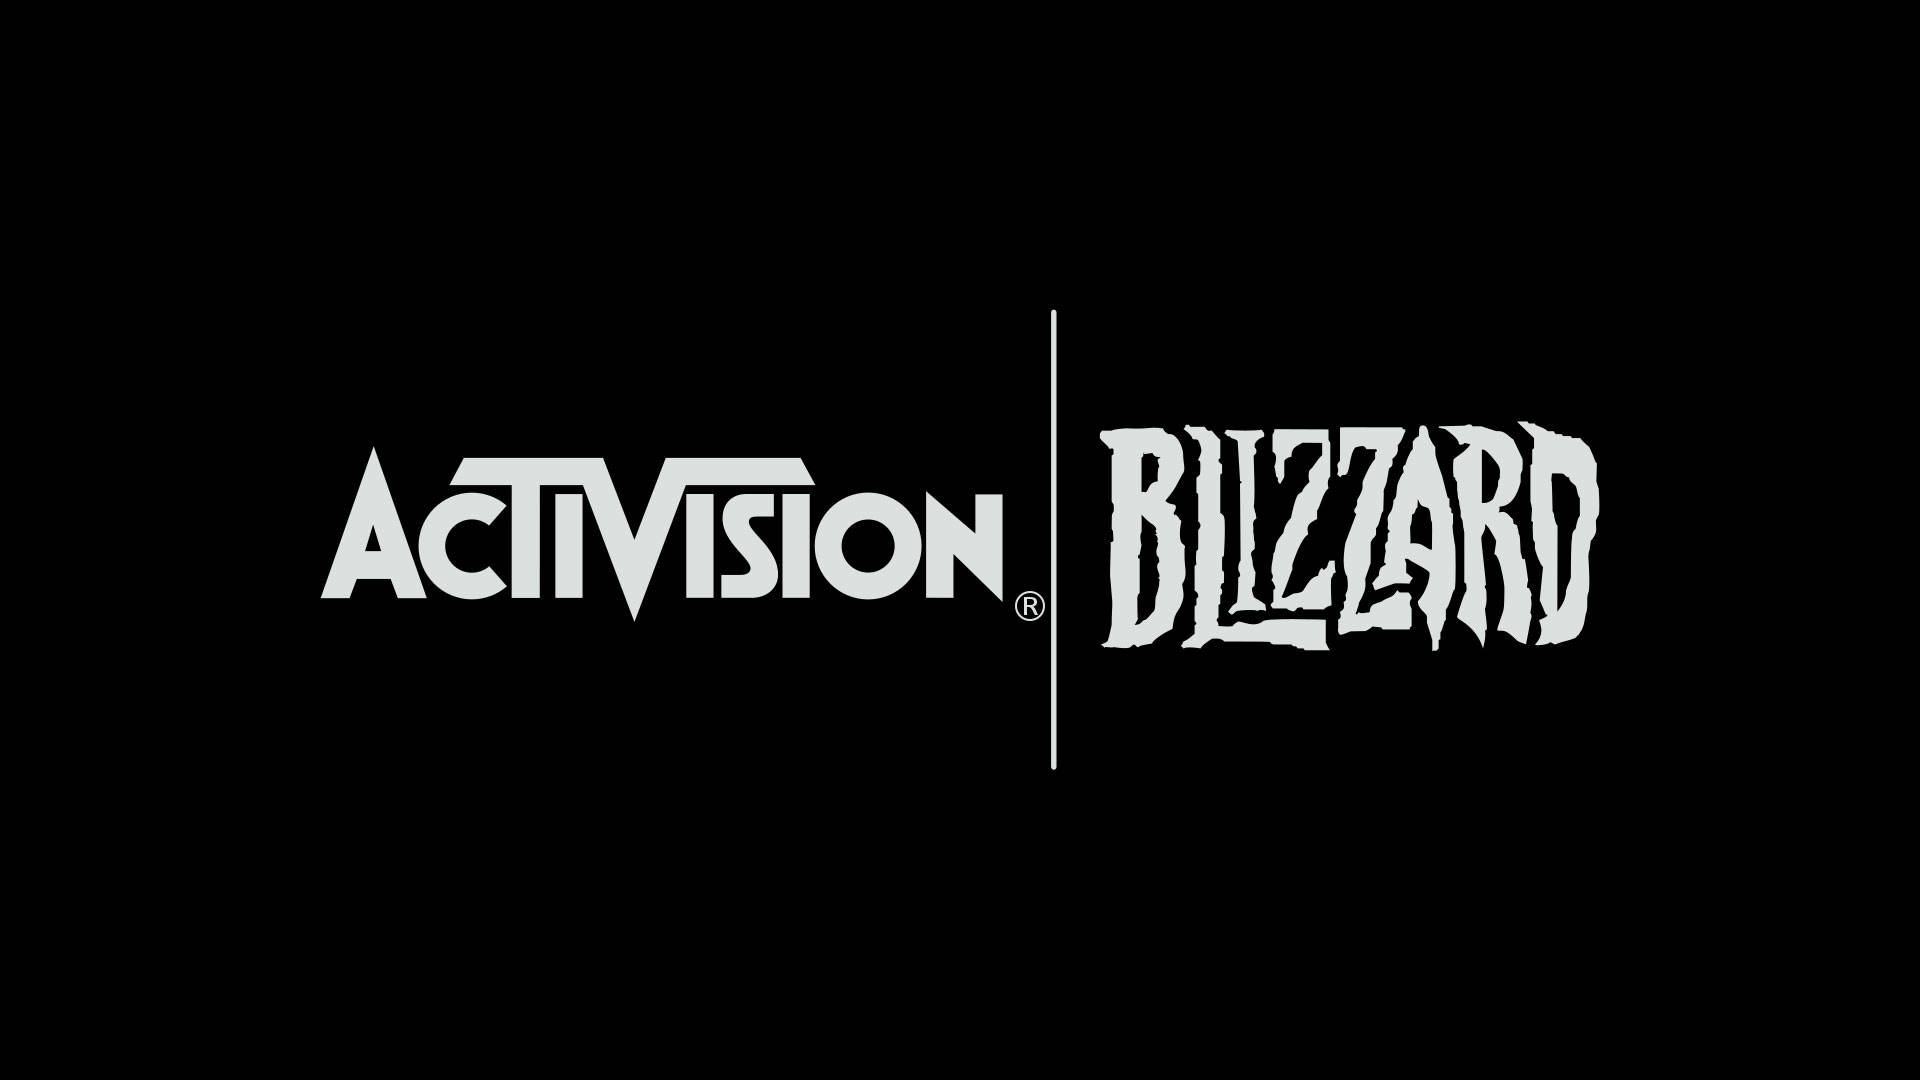 activision blizzard logo 18809